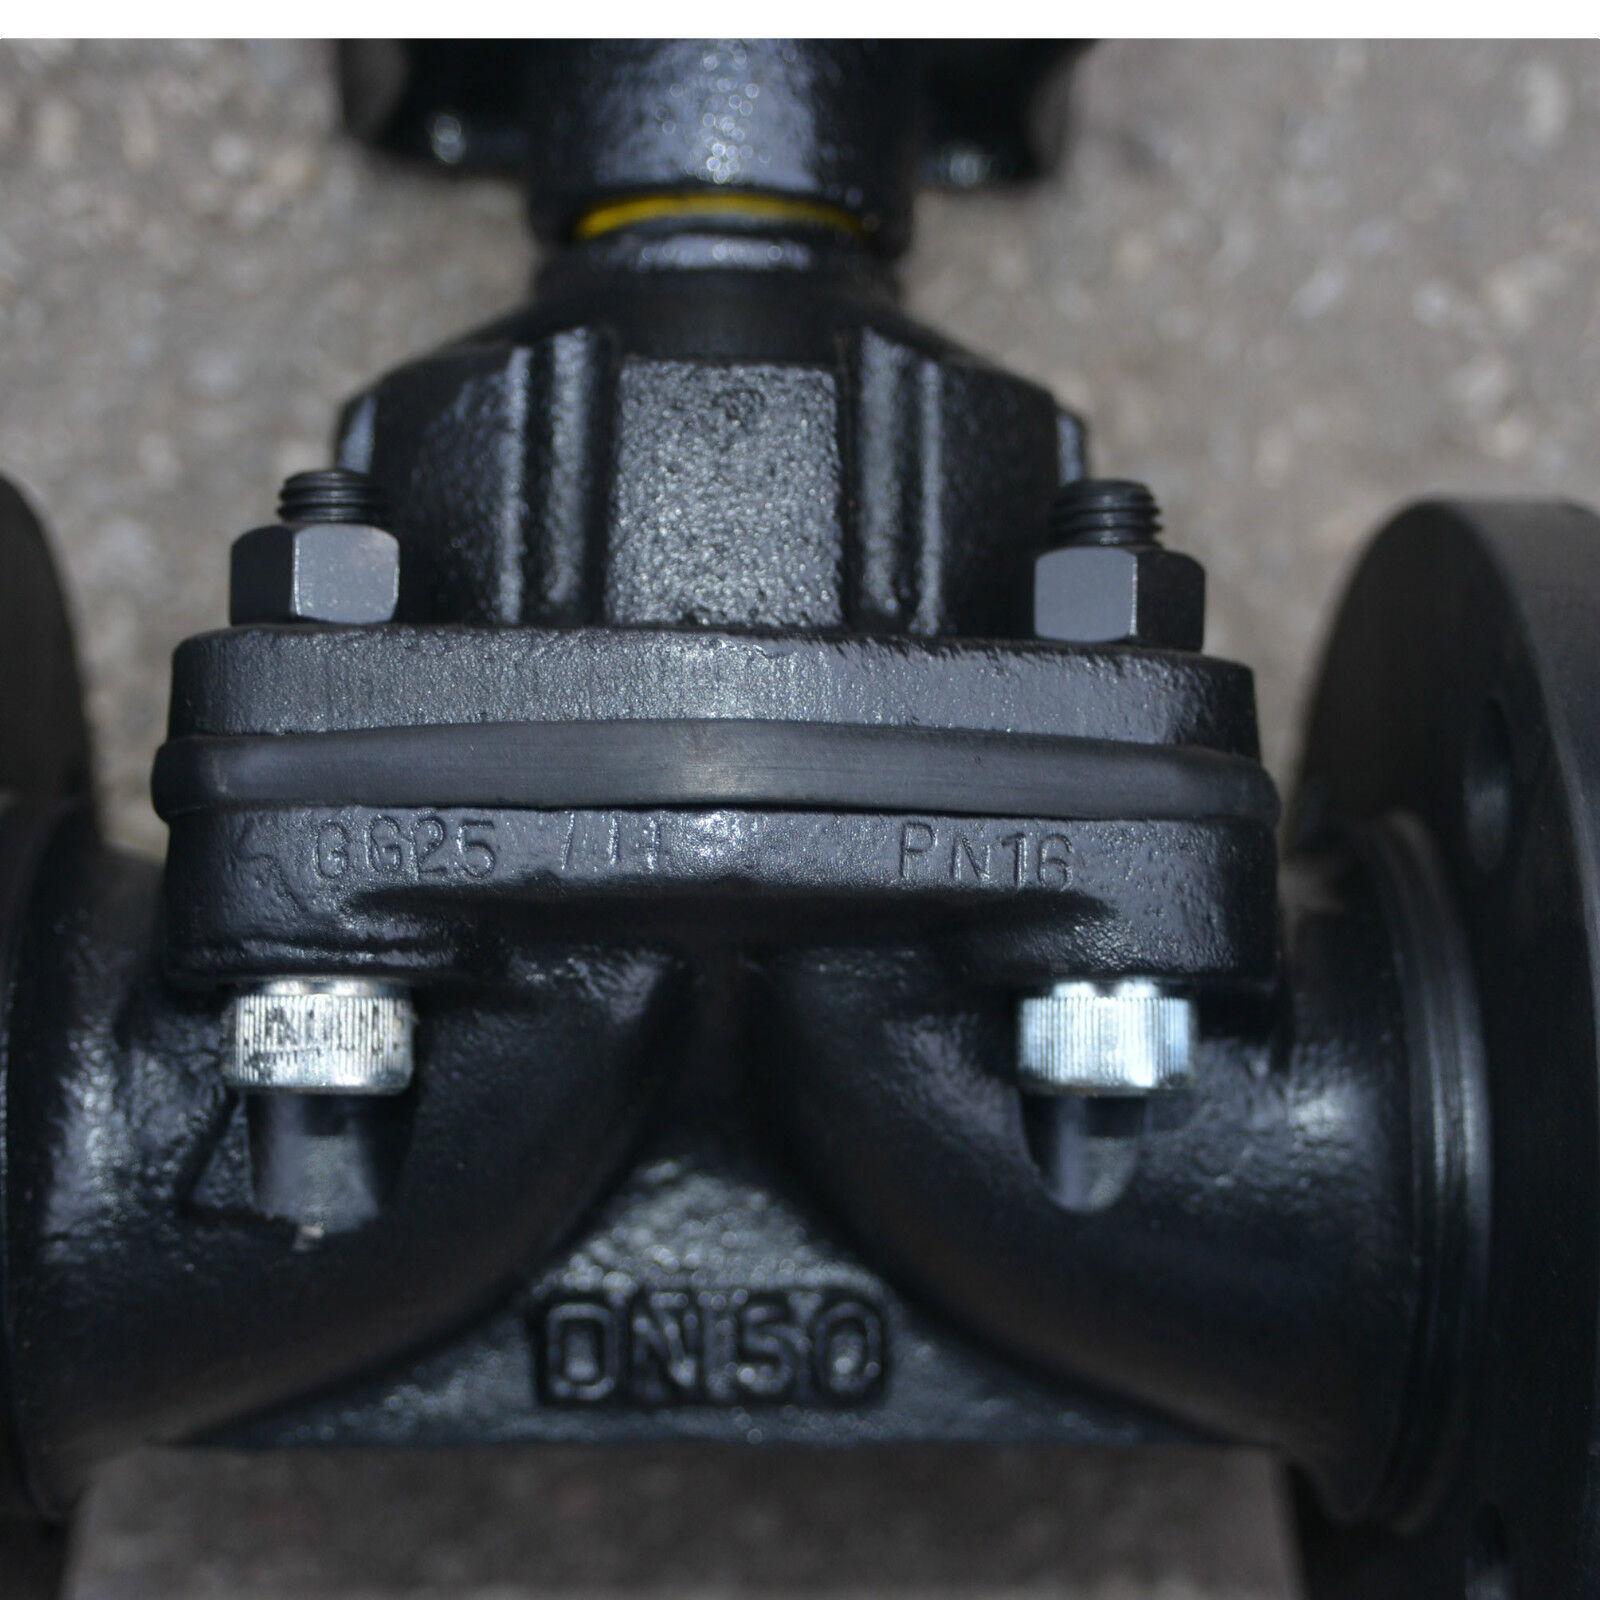 Kdv 2 in dn50 pn 16 diaphragm valve 6406 12660 picclick uk 4 of 12 kdv 2 in dn50 pn 16 diaphragm valve 6406 5 of 12 kdv 2 in dn50 pn 16 diaphragm valve ccuart Gallery